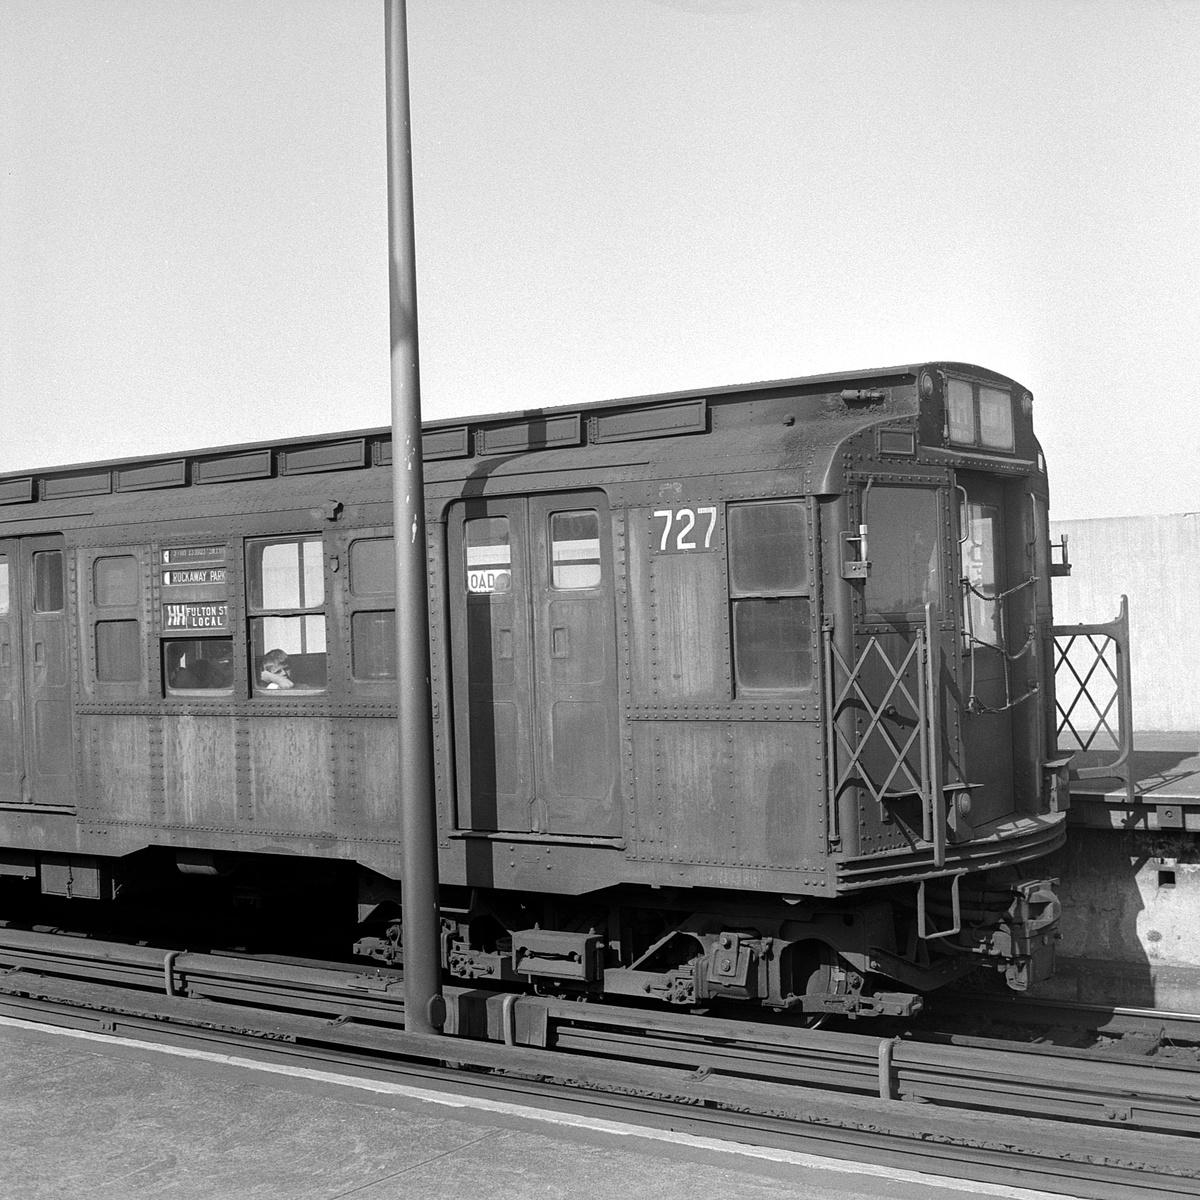 (583k, 1200x1200)<br><b>Country:</b> United States<br><b>City:</b> New York<br><b>System:</b> New York City Transit<br><b>Line:</b> IND Rockaway Line<br><b>Location:</b> Broad Channel<br><b>Route:</b> HH<br><b>Car:</b> R-4 (American Car & Foundry, 1932-1933) 727 <br><b>Collection of:</b> David Pirmann<br><b>Date:</b> 8/23/1969<br><b>Viewed (this week/total):</b> 2 / 295